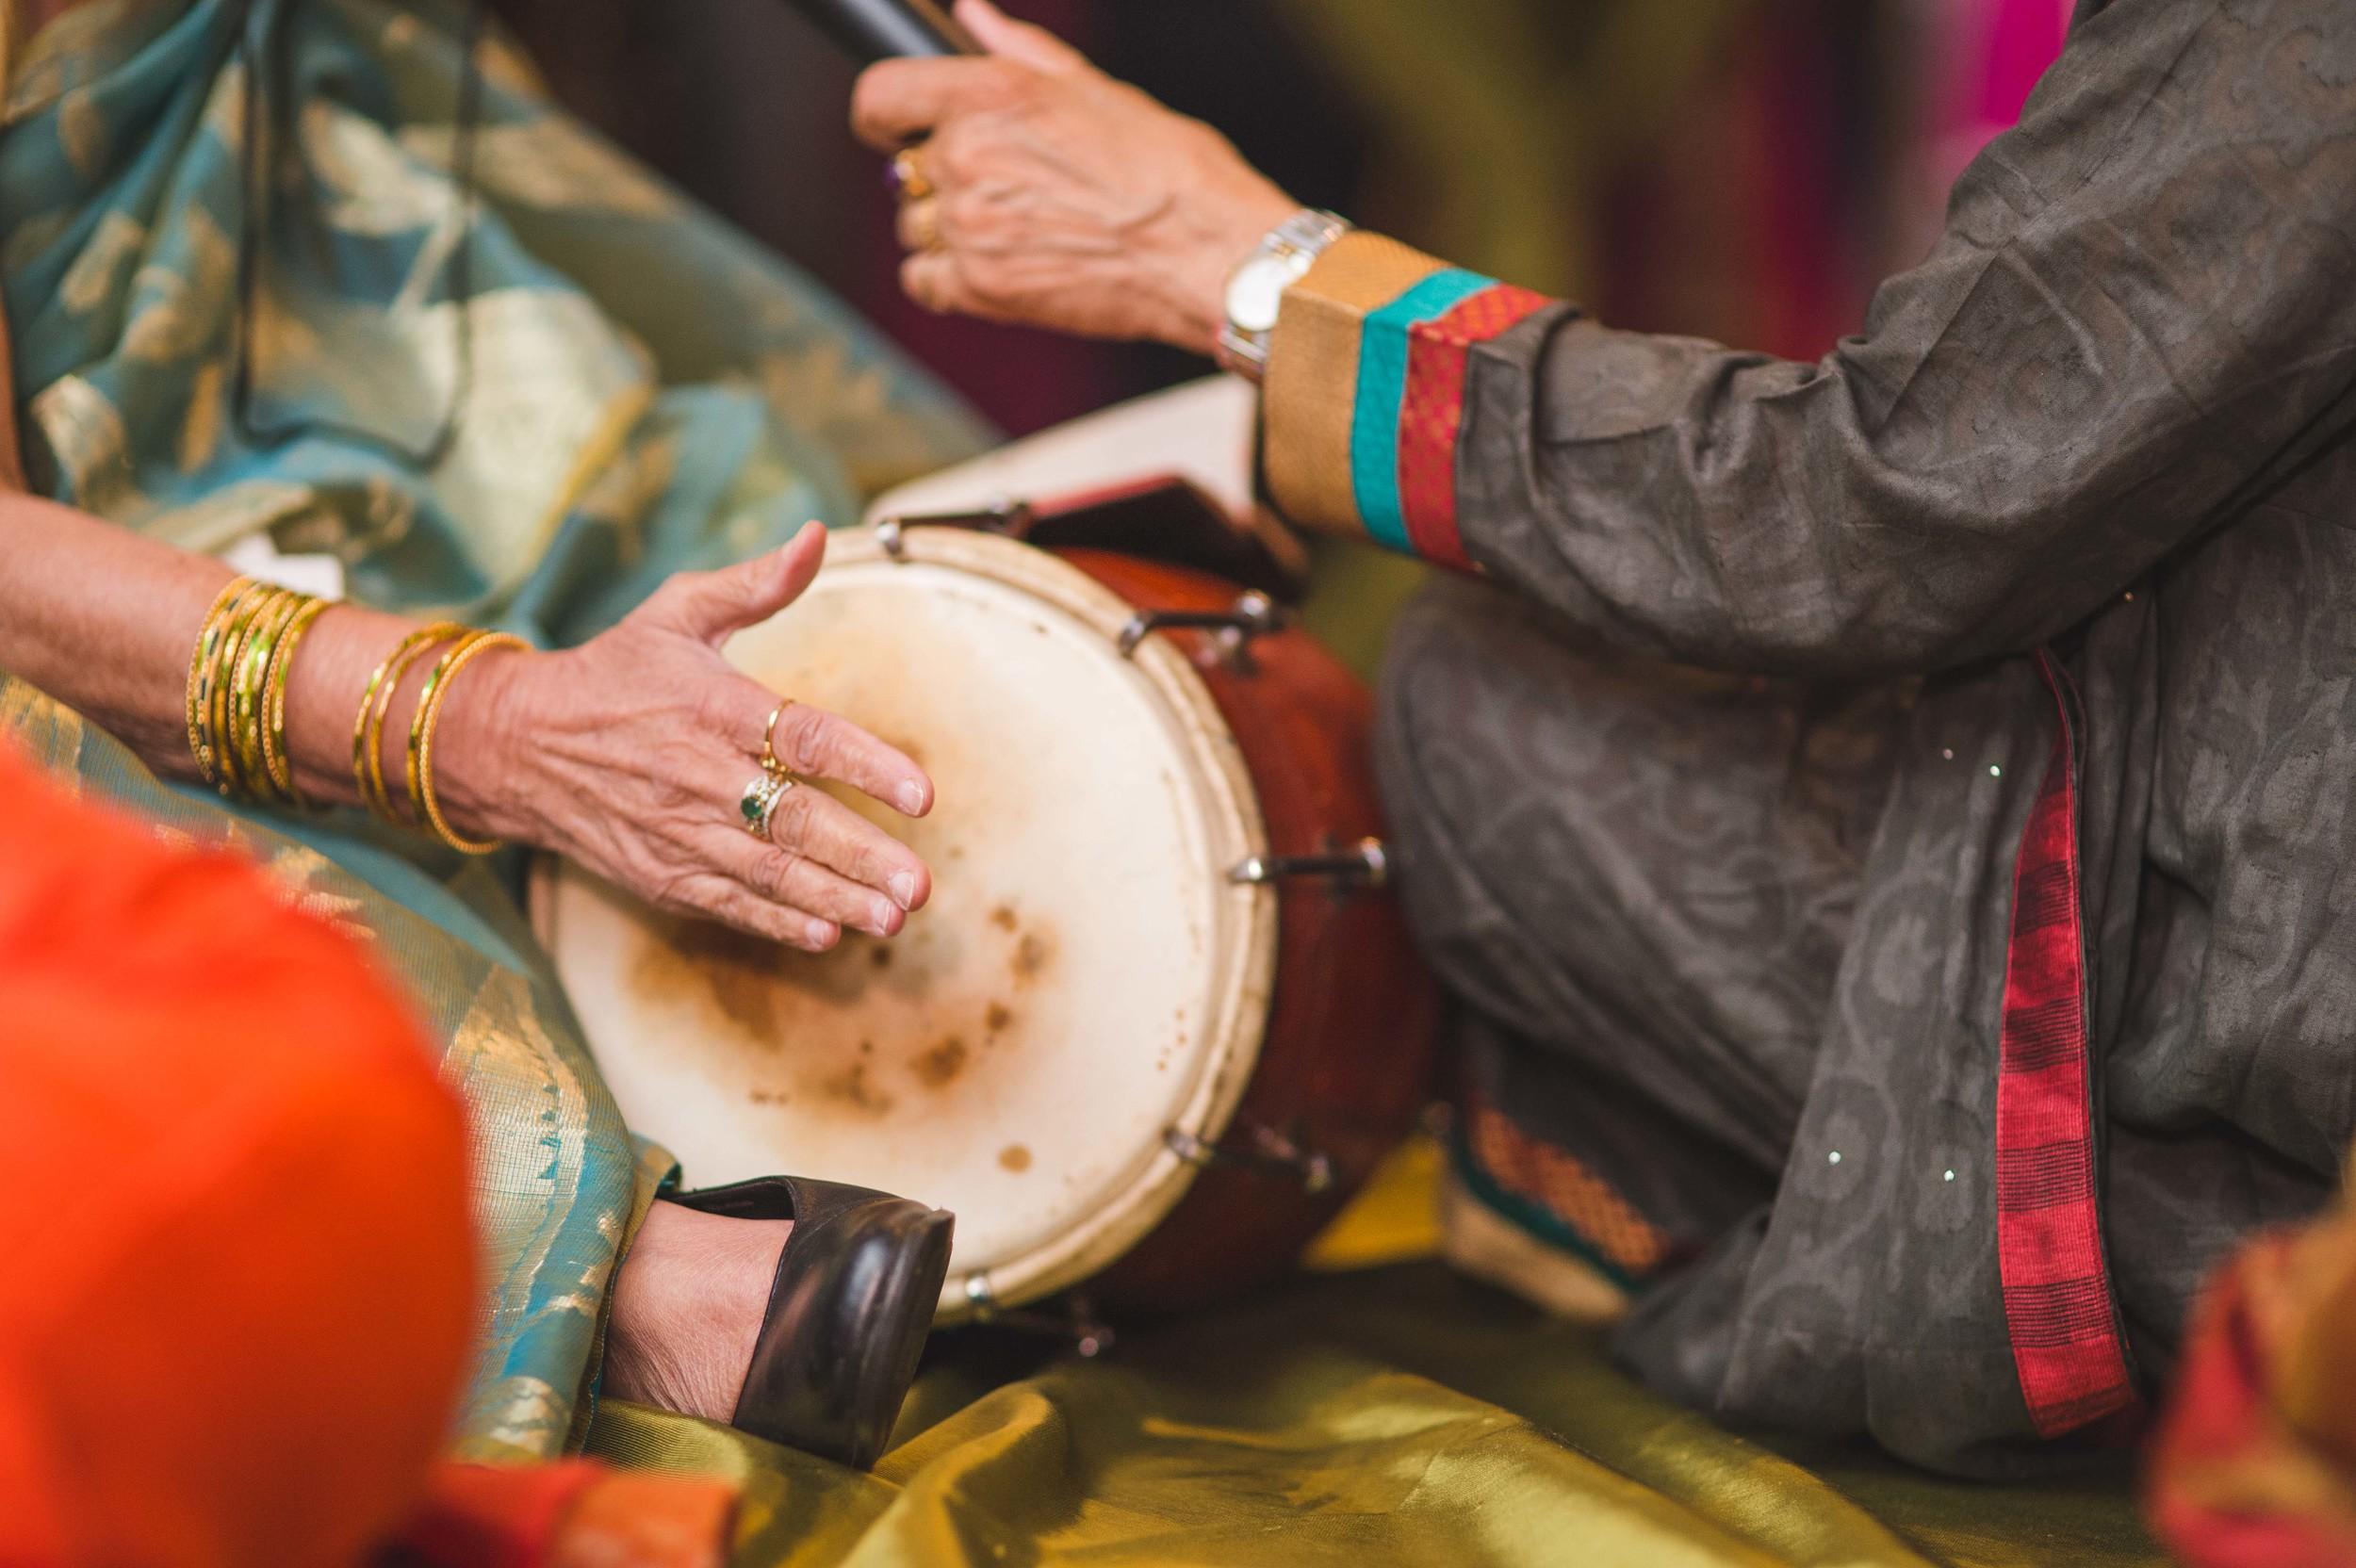 Indian Pre-wedding  at Arena Stage Washington DC by Mantas Kubilinskas-23.jpg